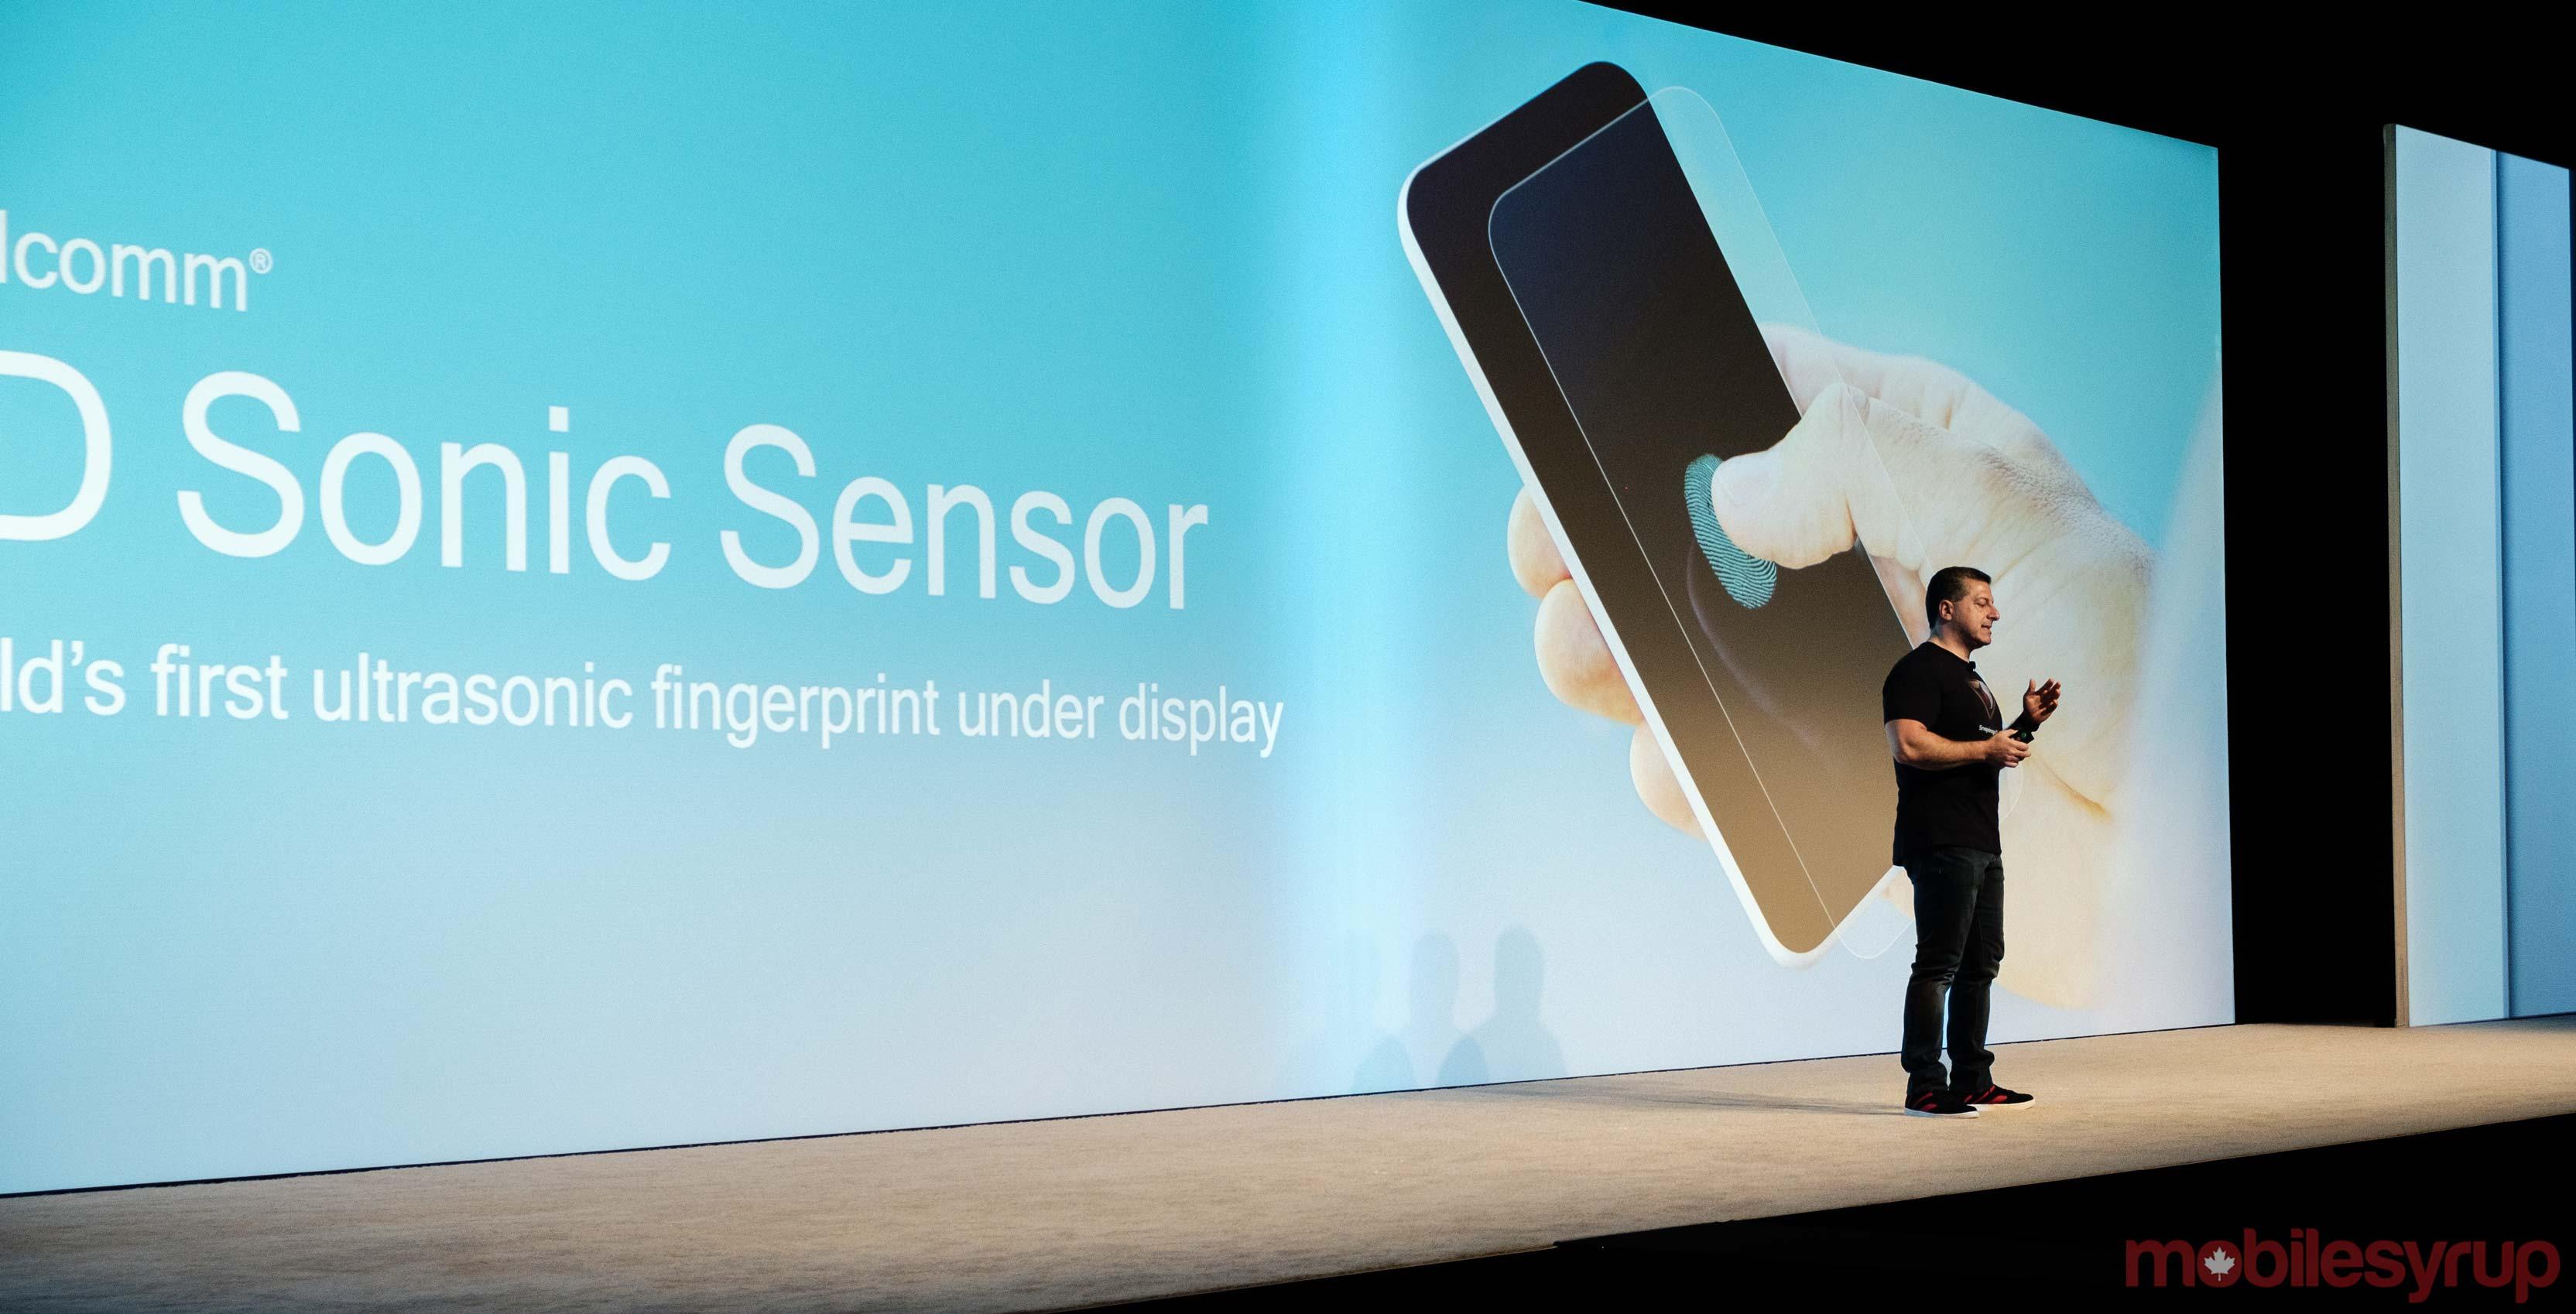 Qualcomm's announced its new 3D Sonic Sensor